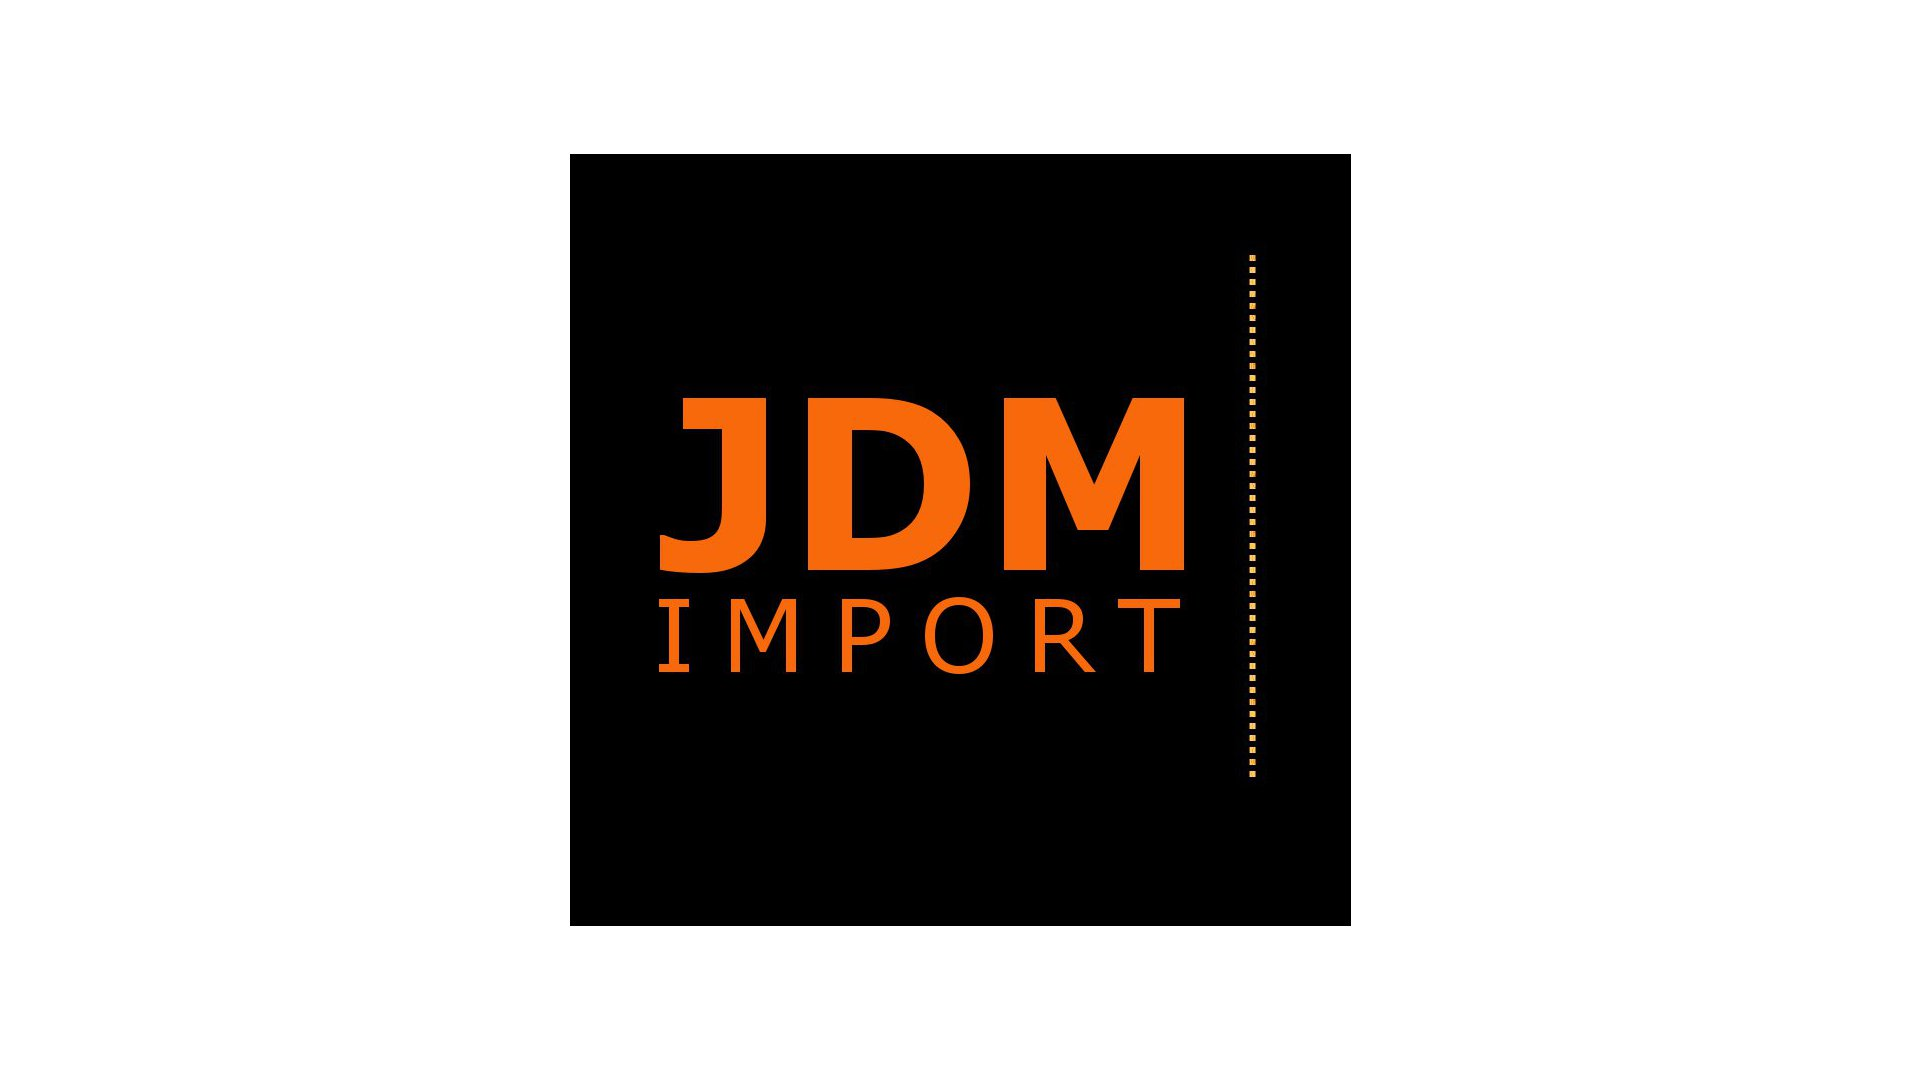 JDM IMPORT